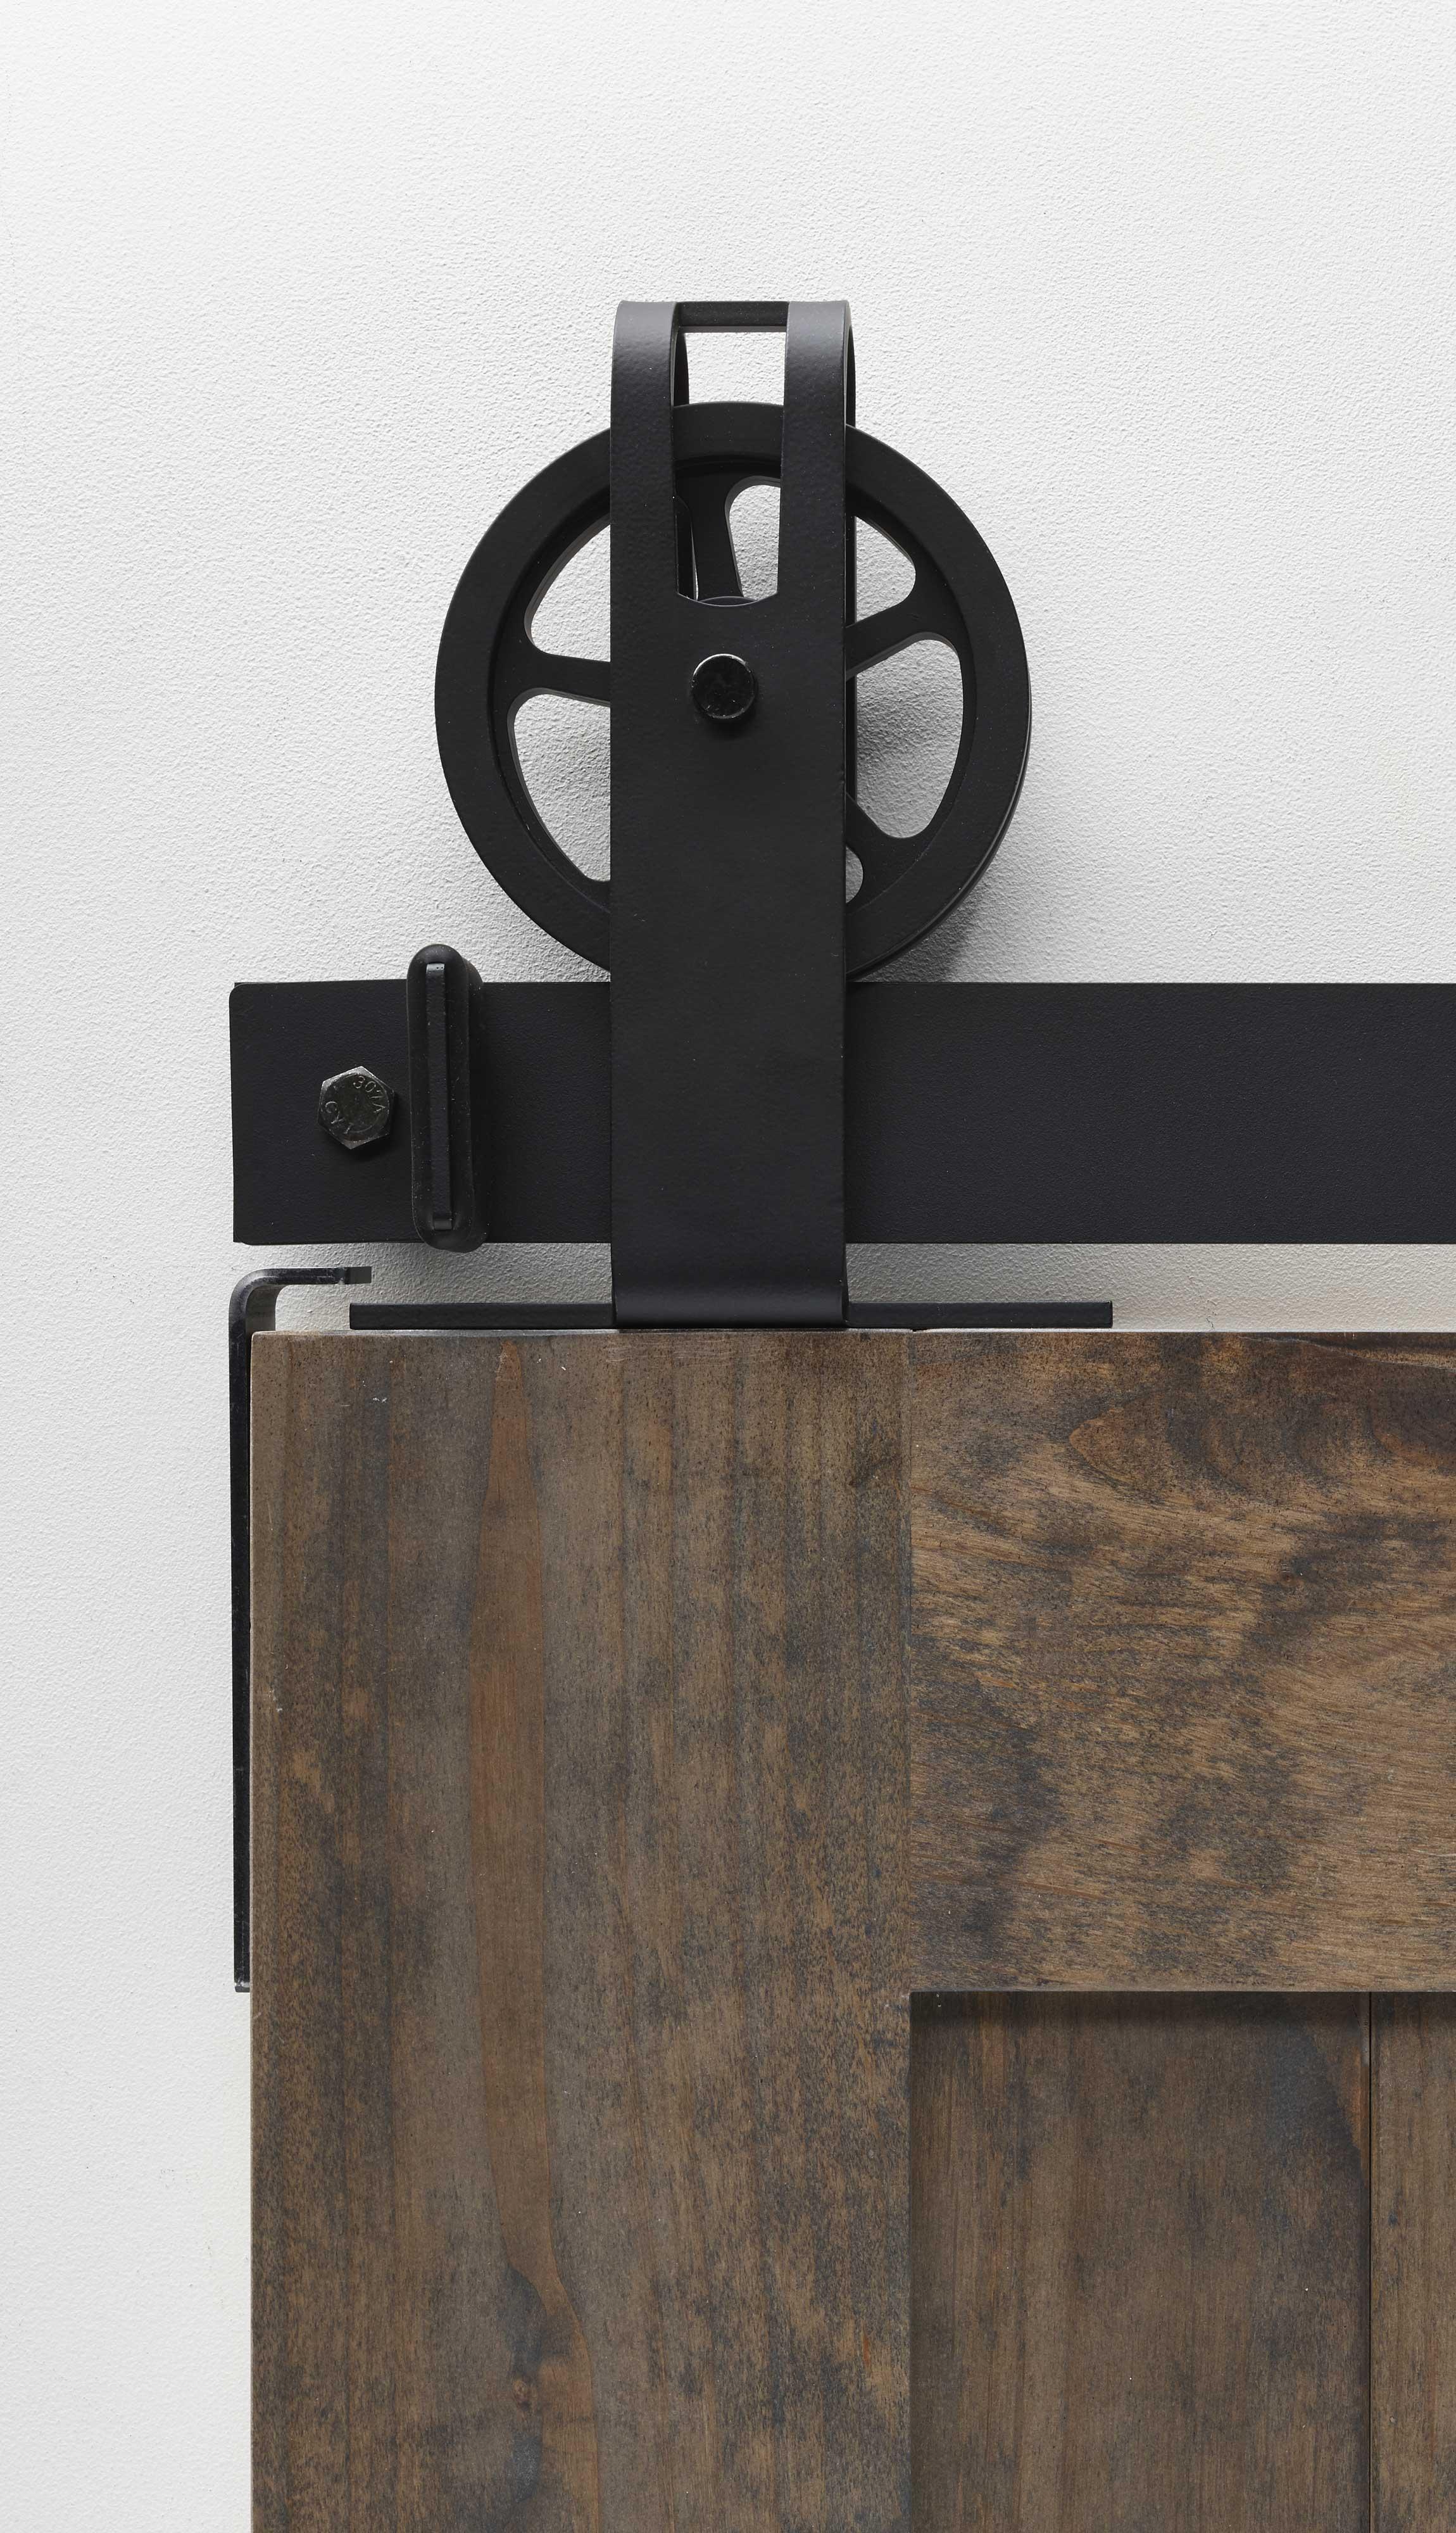 Top Mount Spoke Wheel Garrick Barn Door Hardware Kit